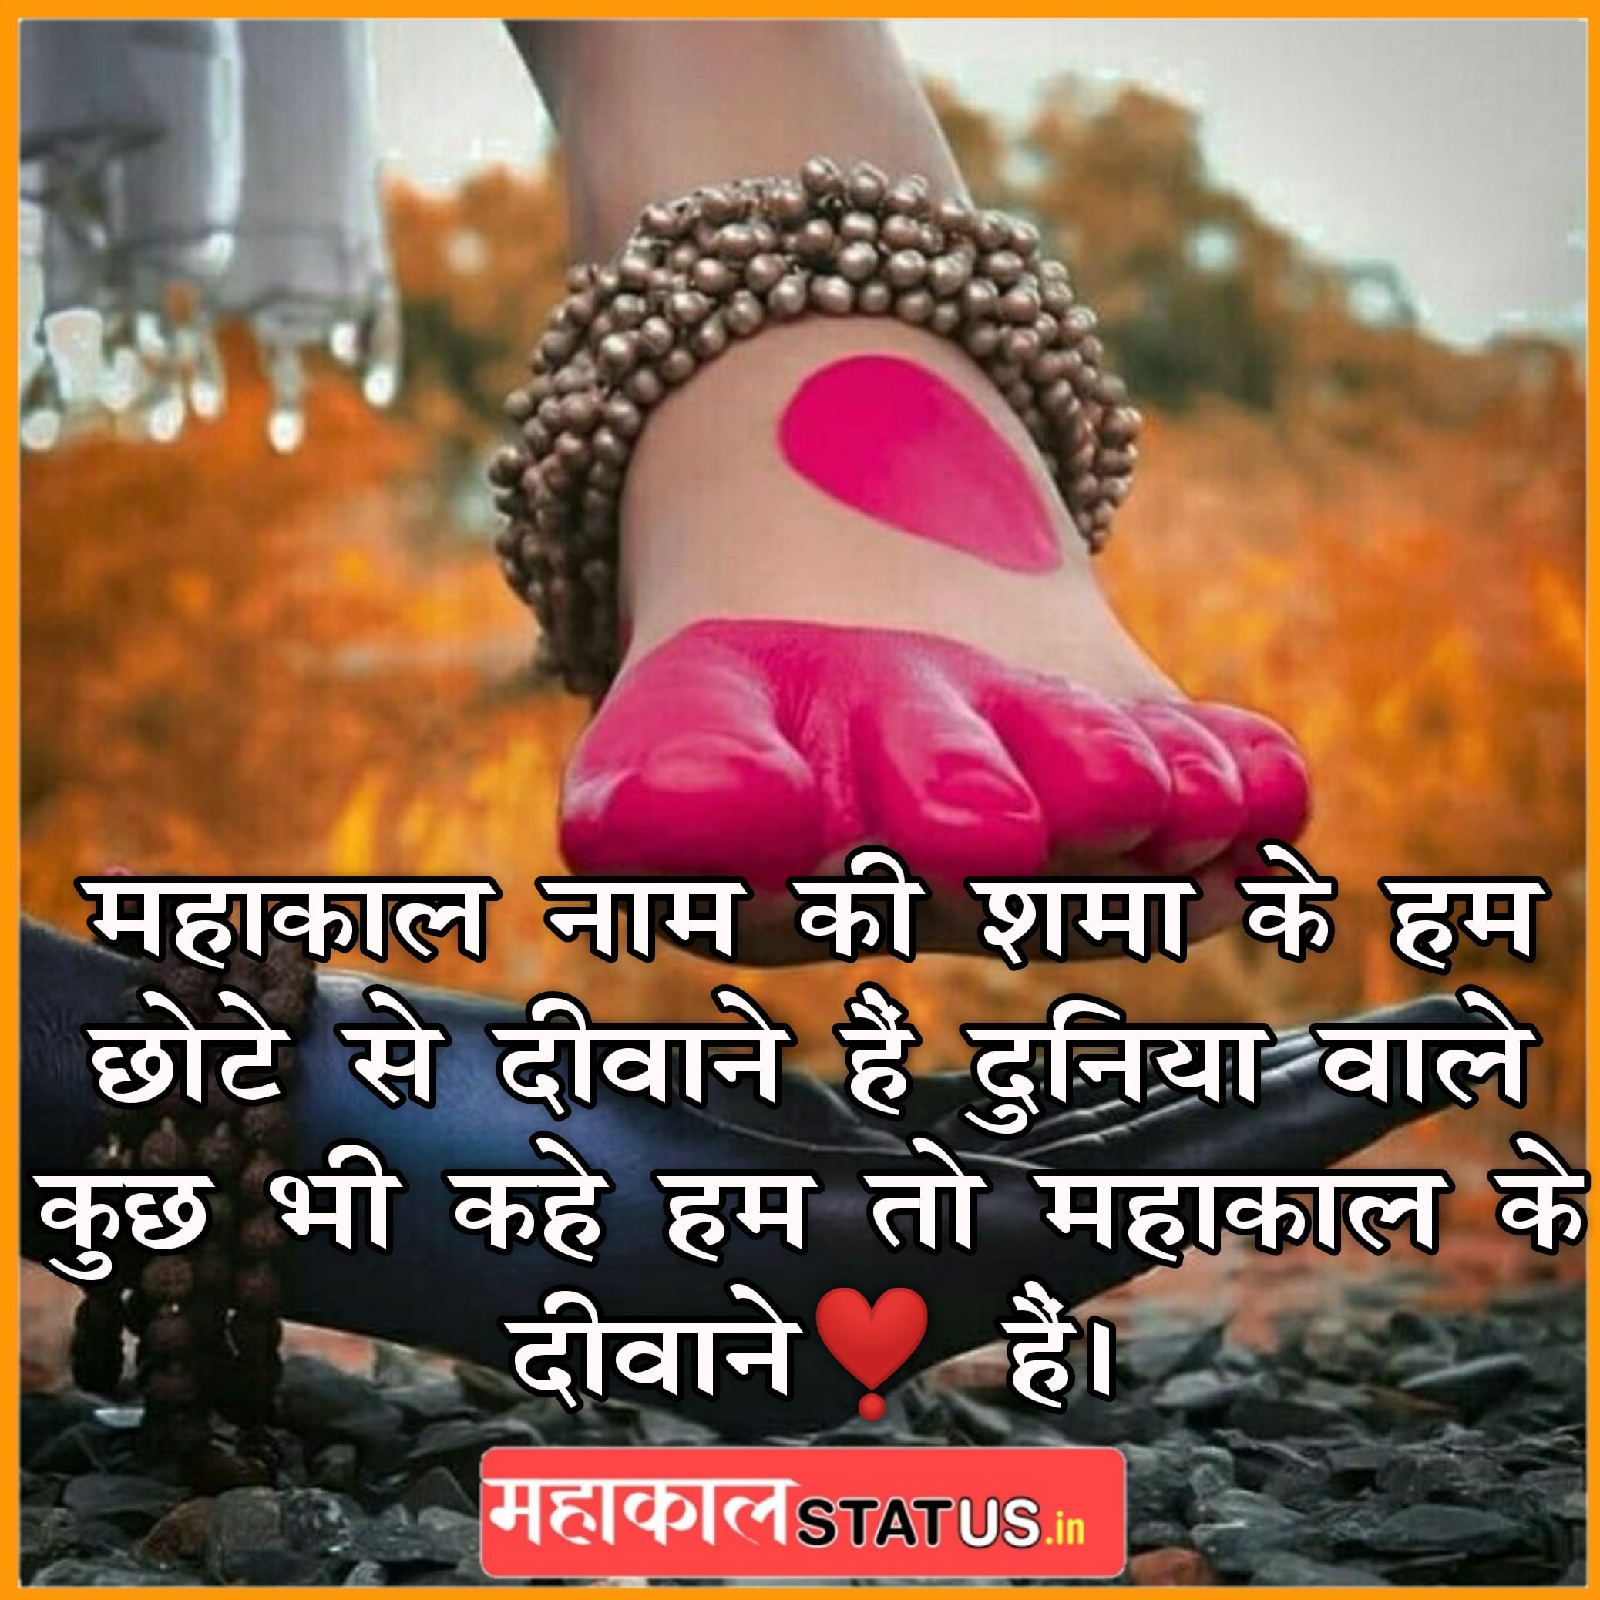 Top 10 Mahakal Status in Hindi